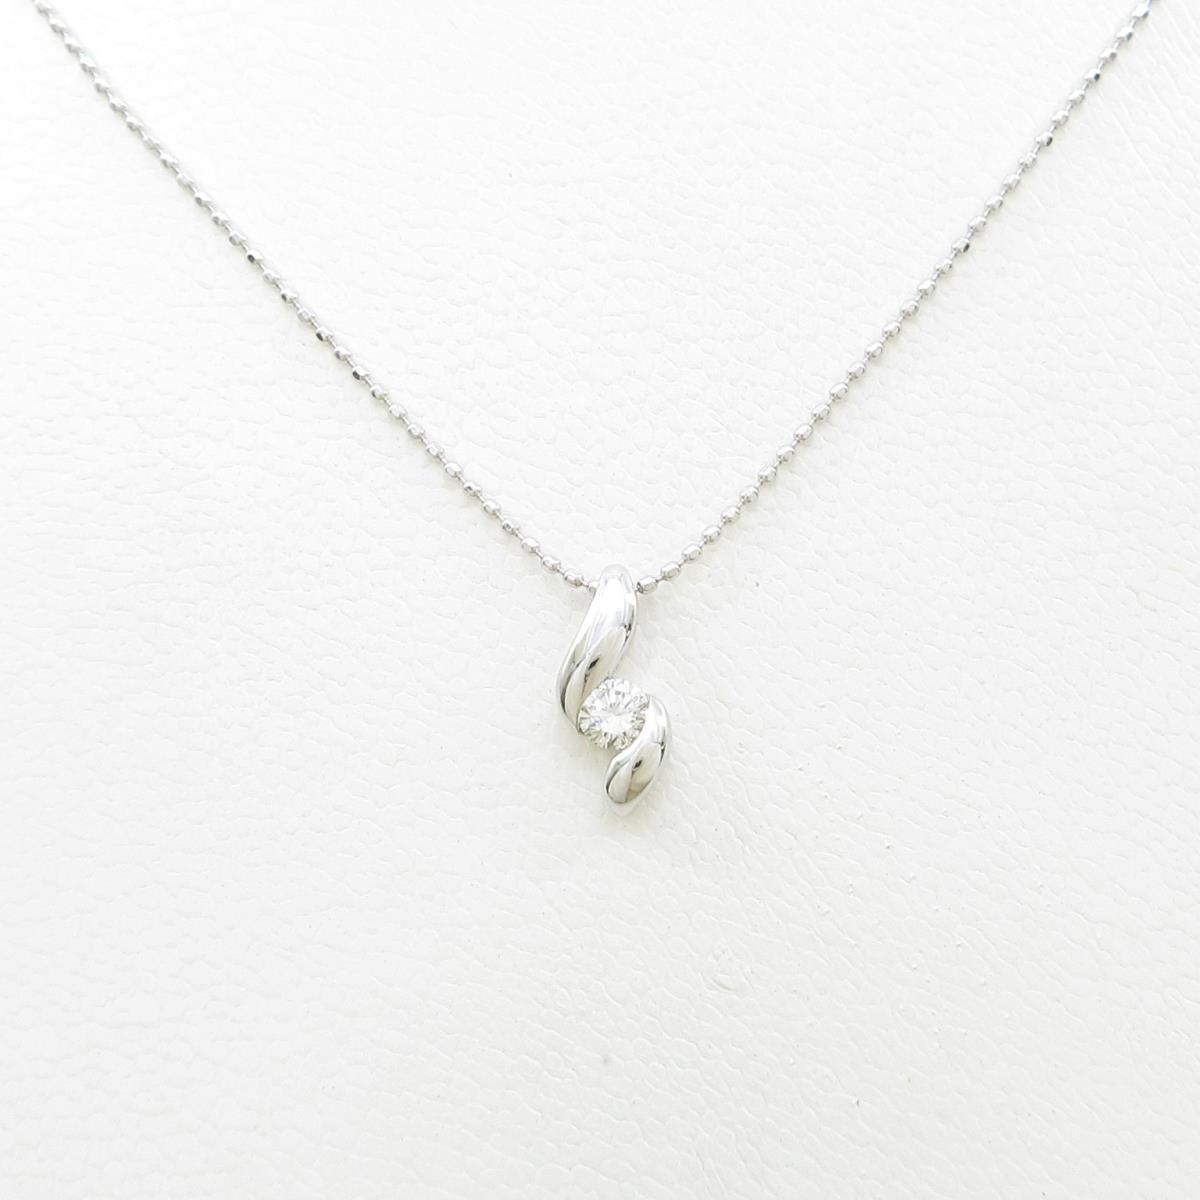 PT/K18WG ダイヤモンドネックレス